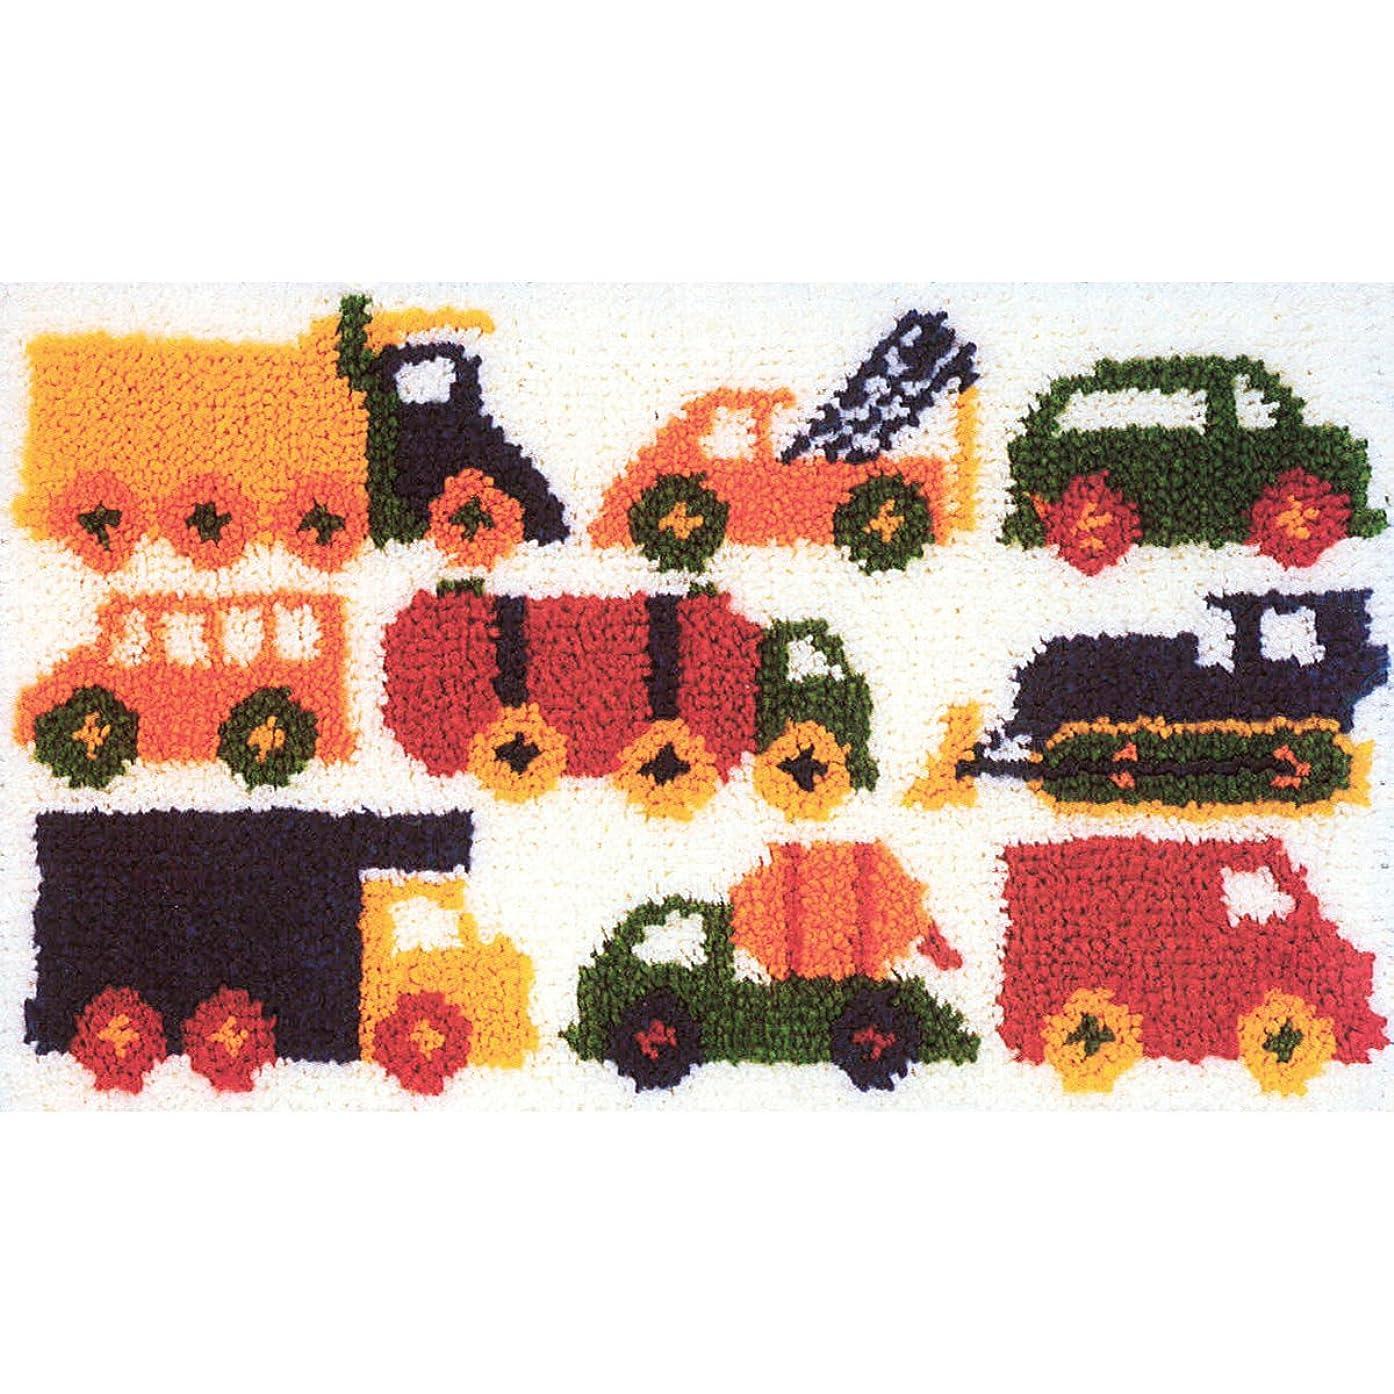 M C G Textiles Latch Hook Kit, 26-1/2-Inch by 16-Inch, Traffic Jam